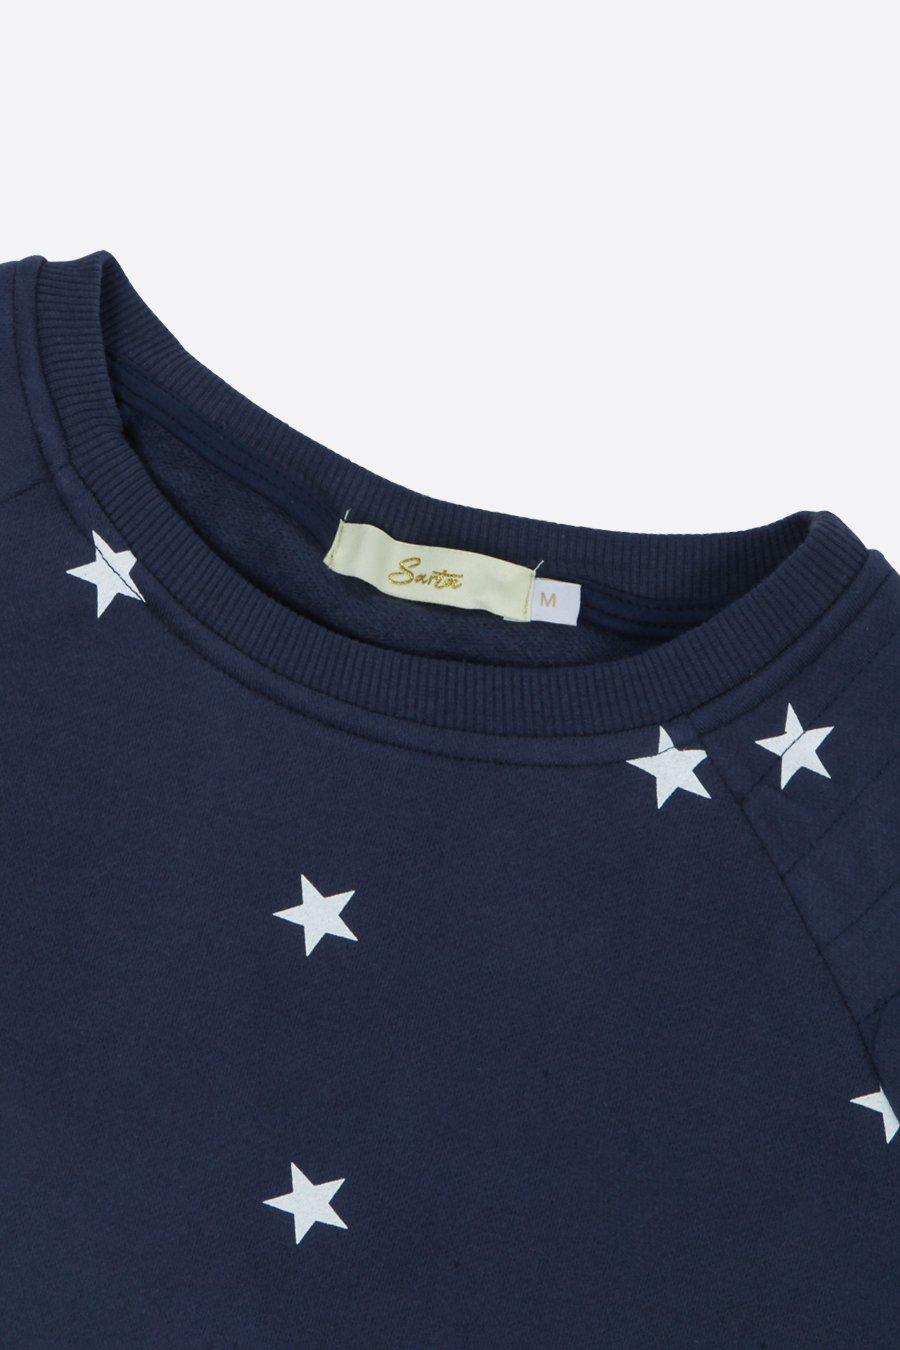 All Over Star Sweatshirt - Navy Blue